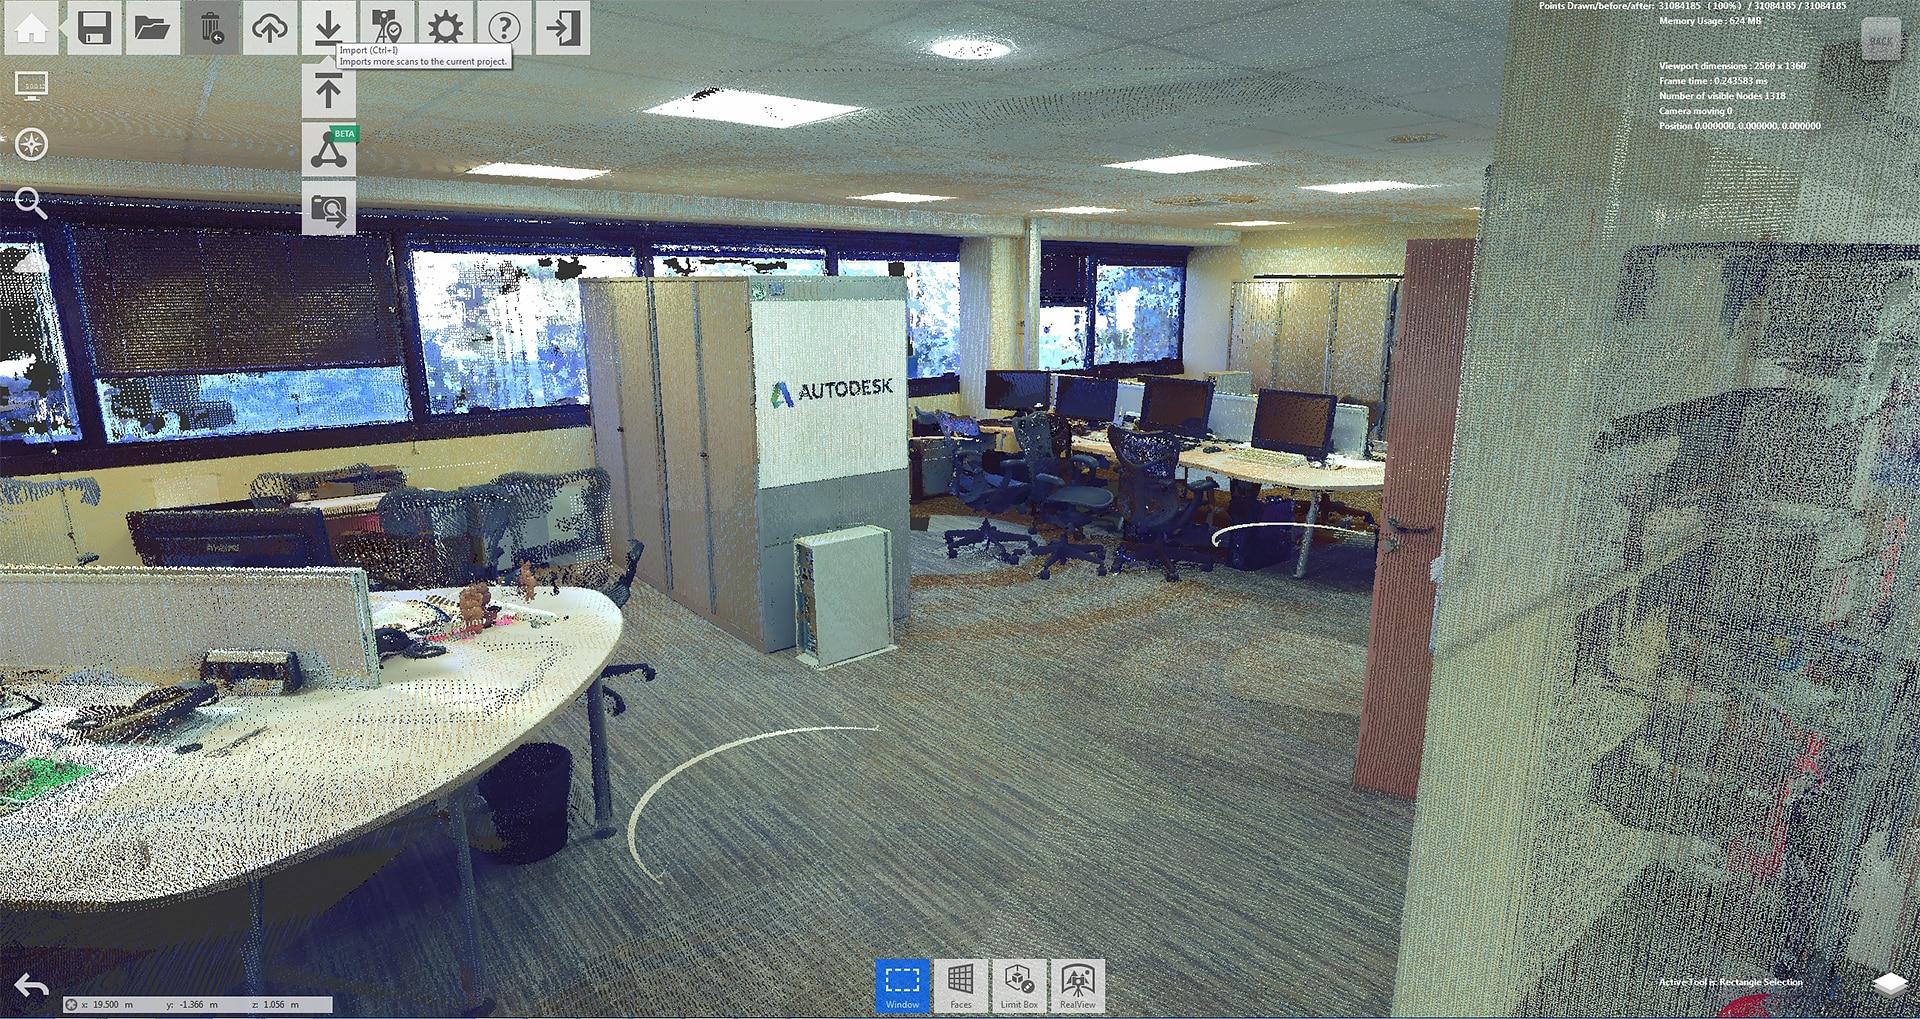 Working with Autodesk ReCap Pro 2021 full license